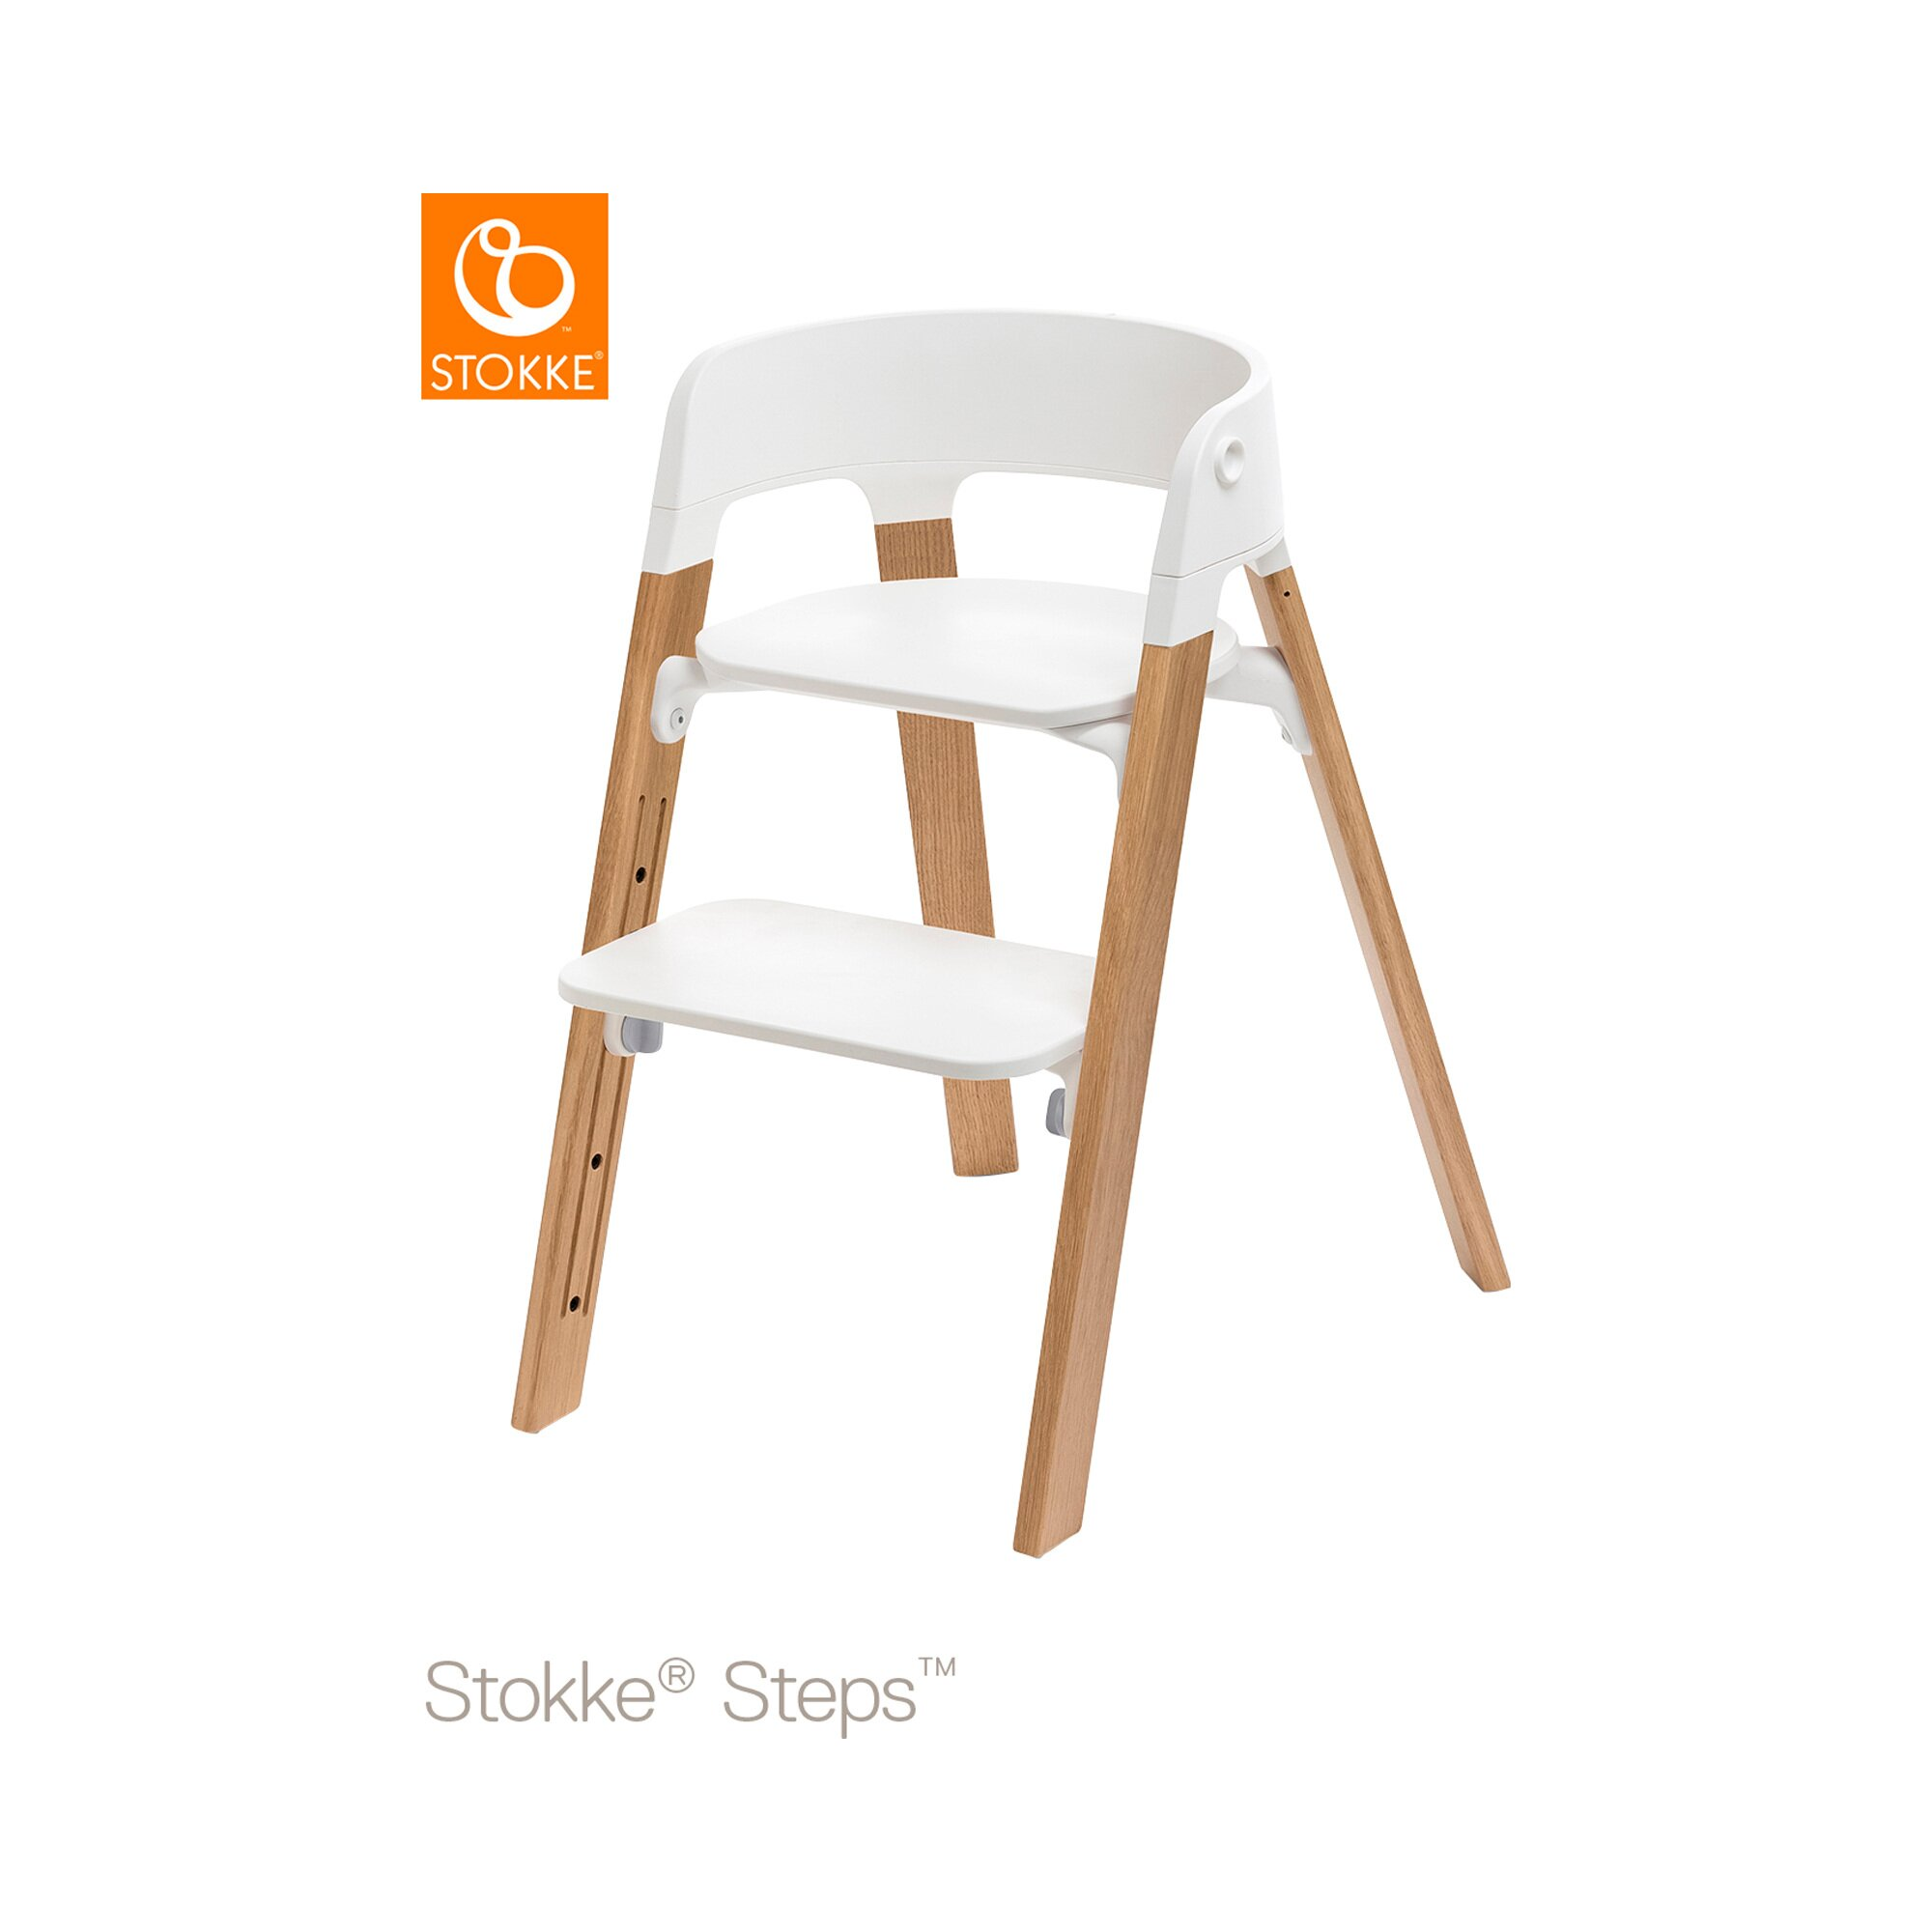 steps-stokke-steps-beine-eiche-natur